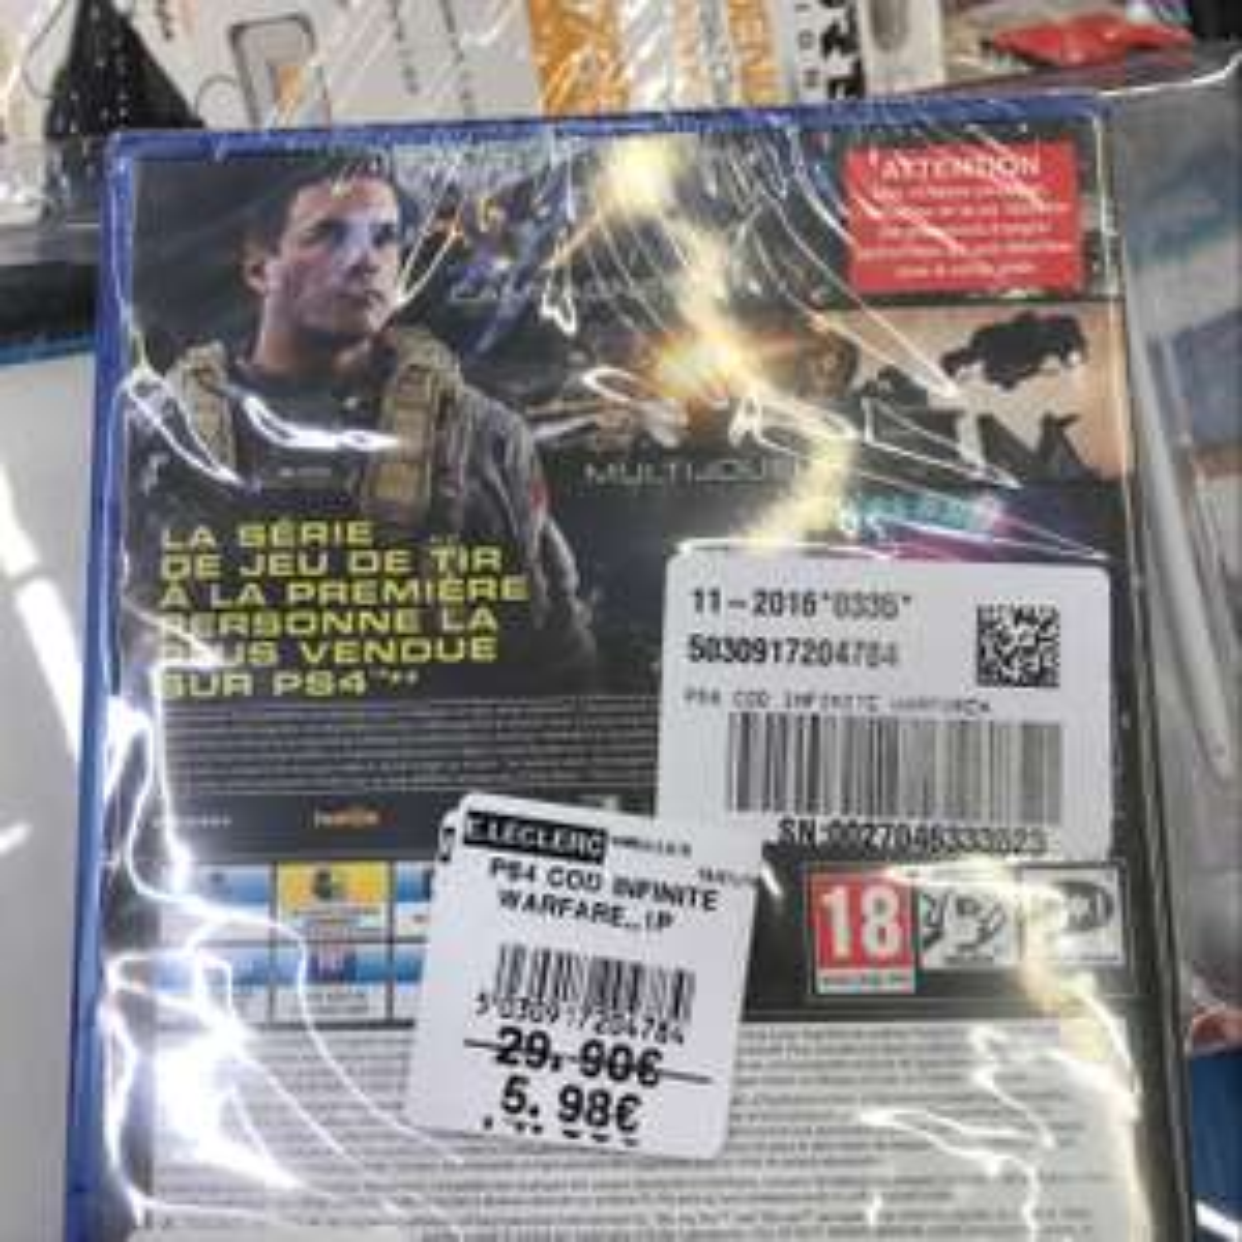 Call of duty infinite warfare sur PS4 - Mareuil-lès-Meaux (77)